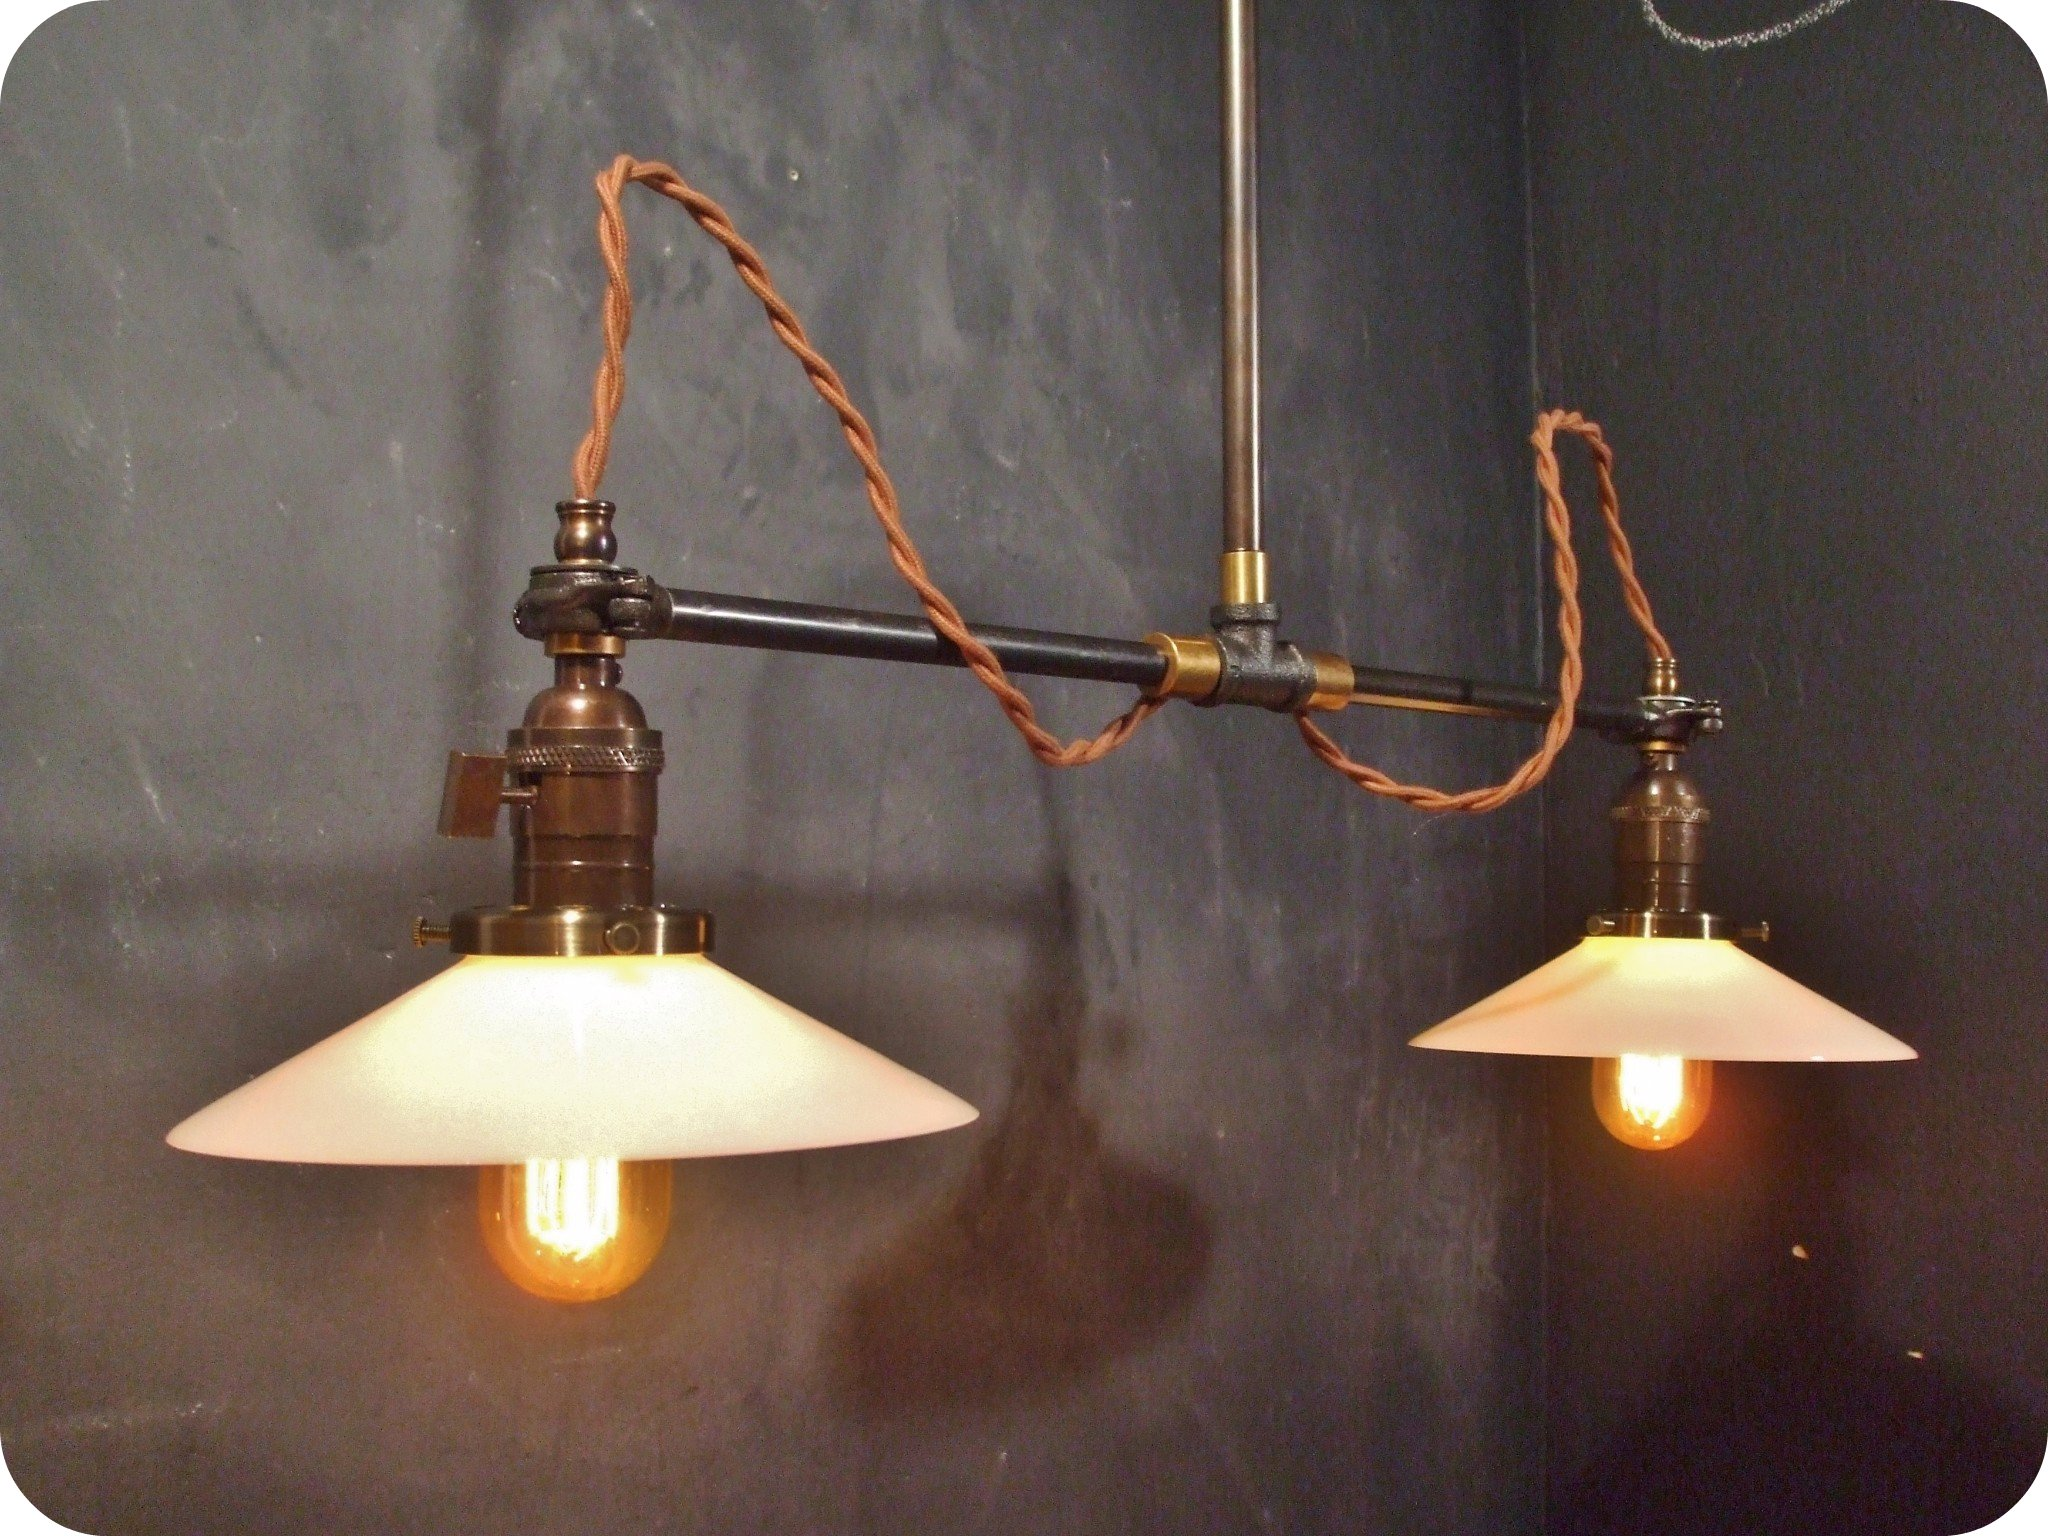 vintage lighting dscf2568_original ZBTPYRC